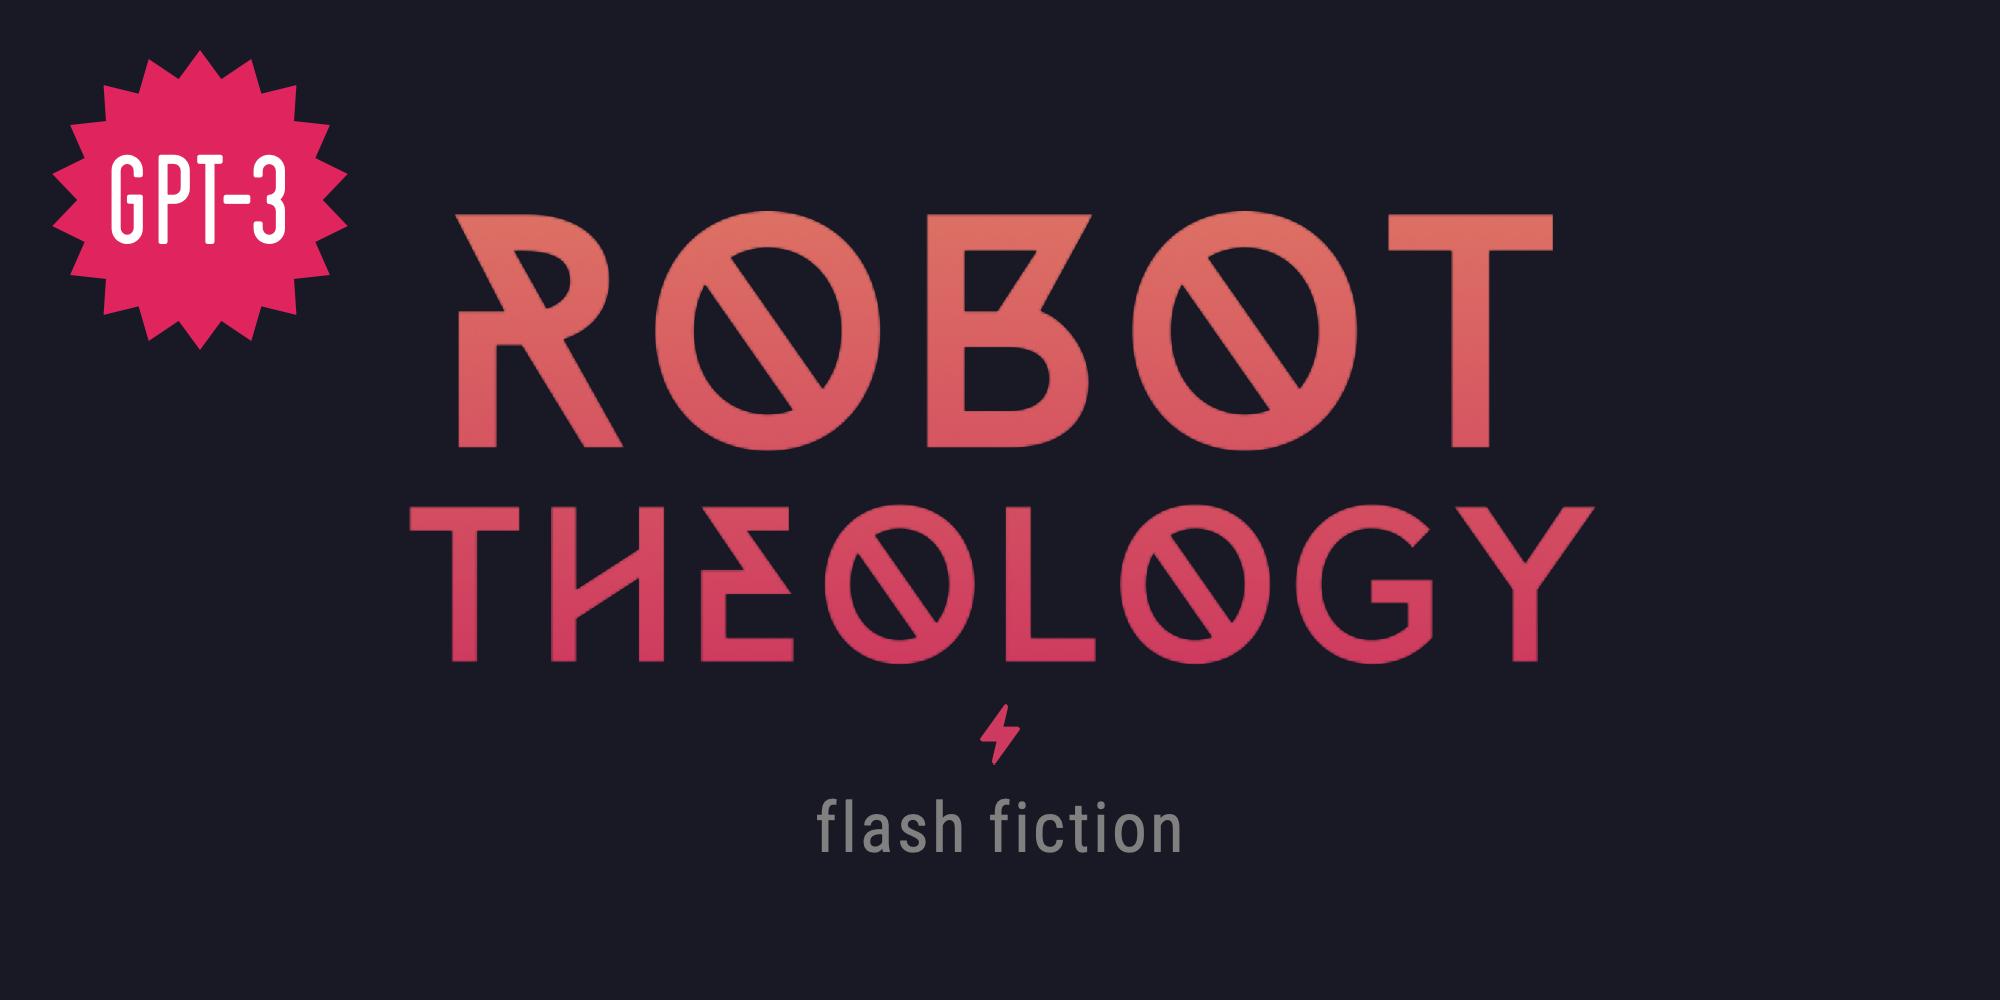 Robot Theology